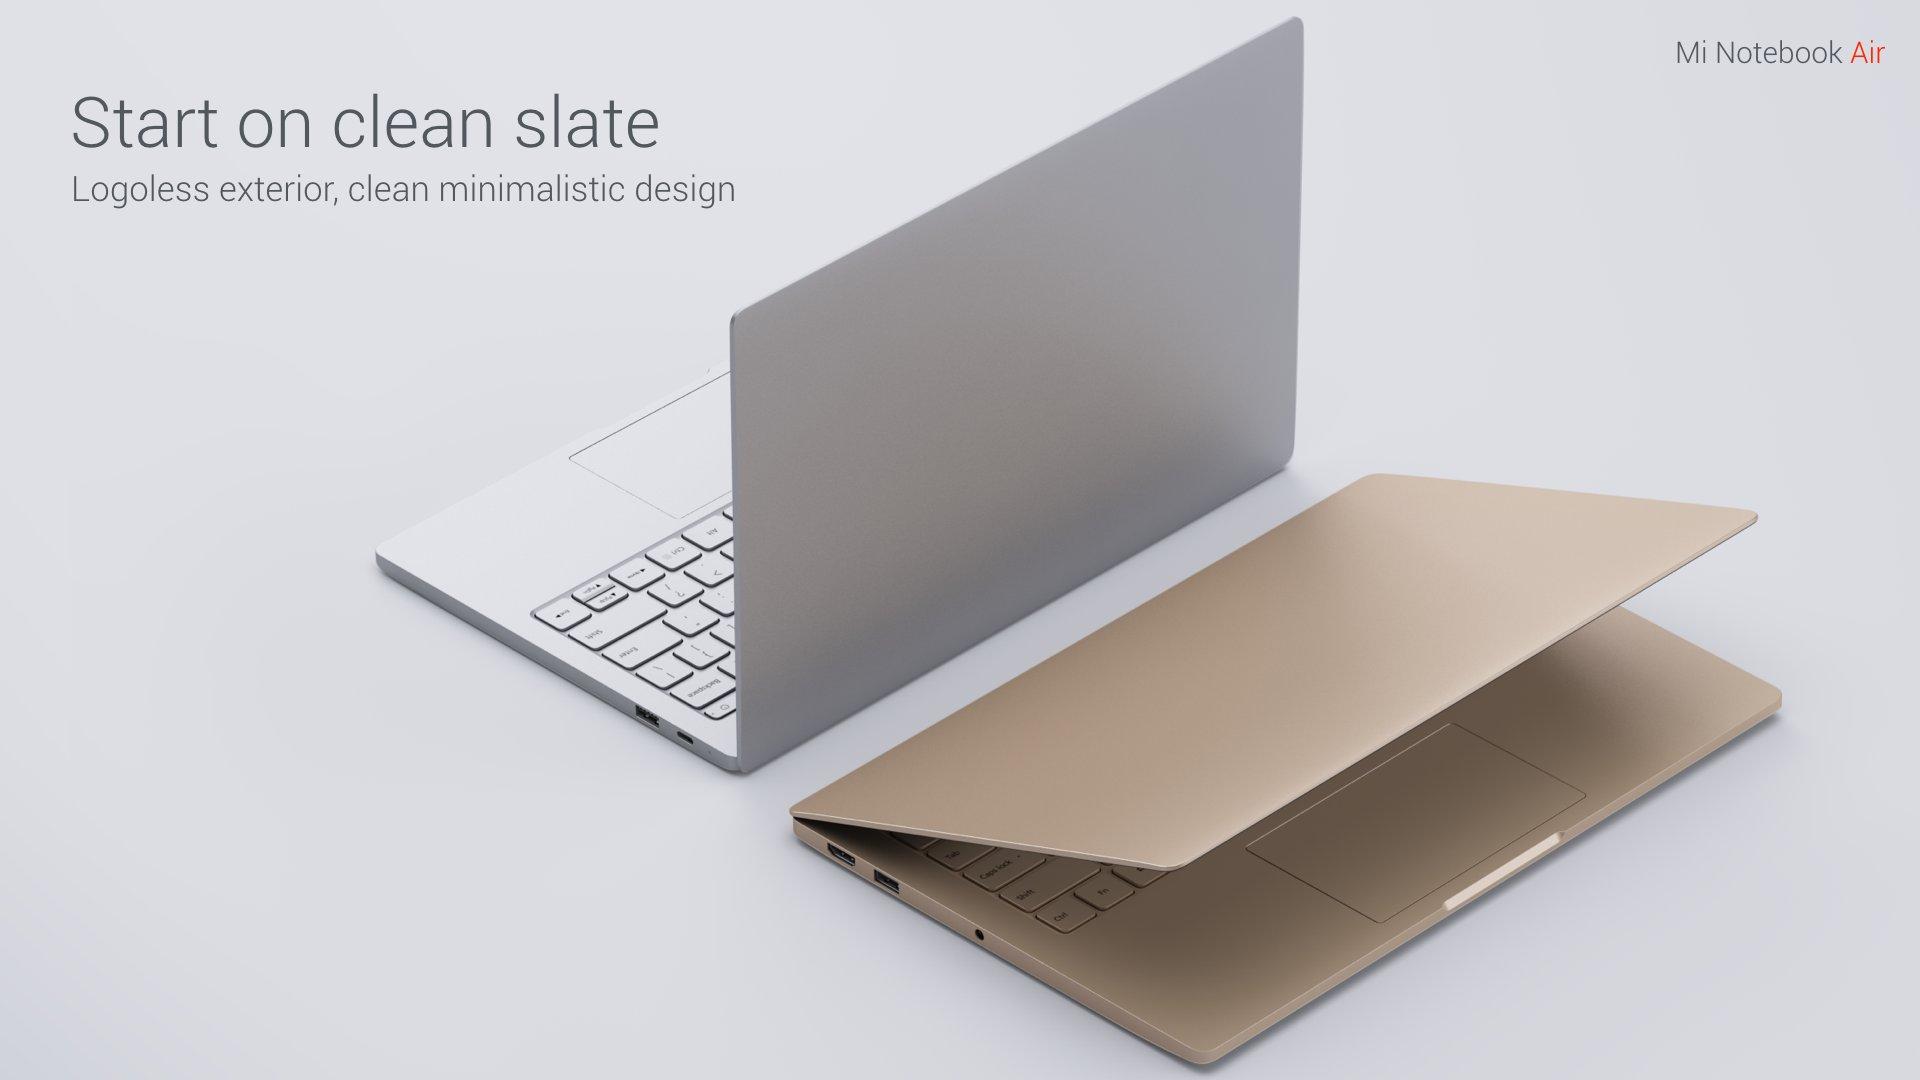 Xiaomi unveils the Mi Notebook Air, its Macbook Air killer 7